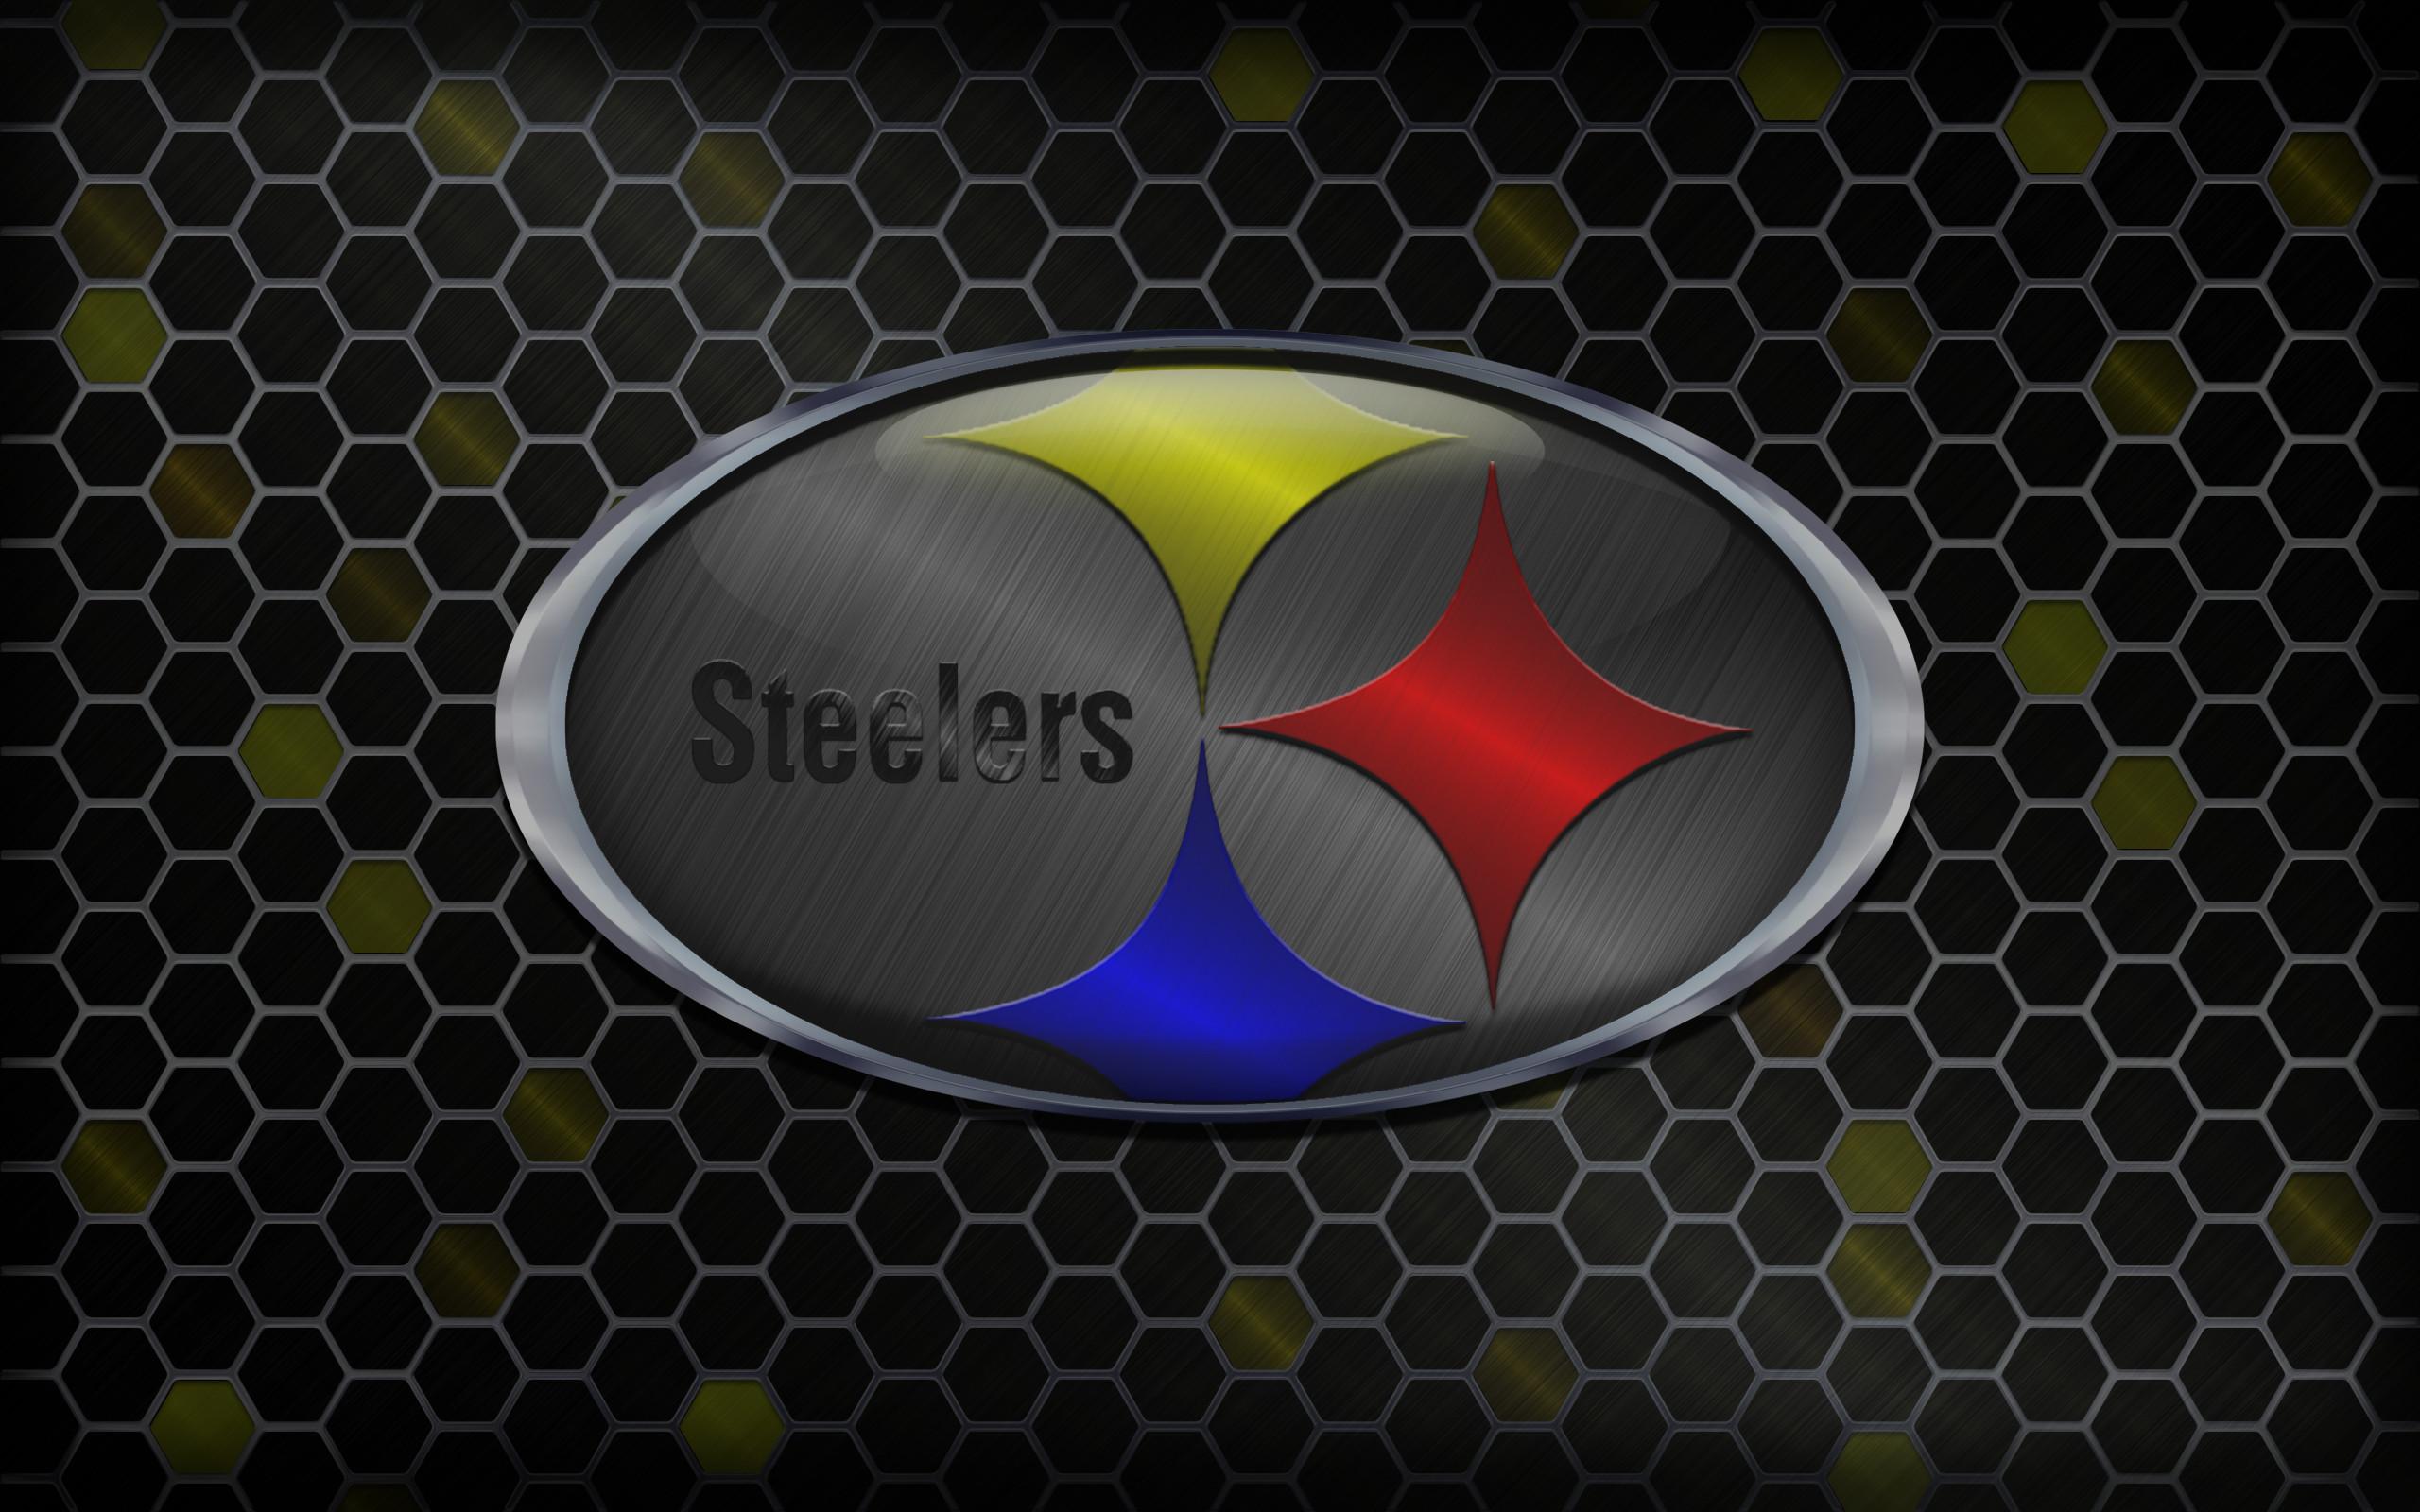 HD Pittsburgh Steelers Wallpapers.